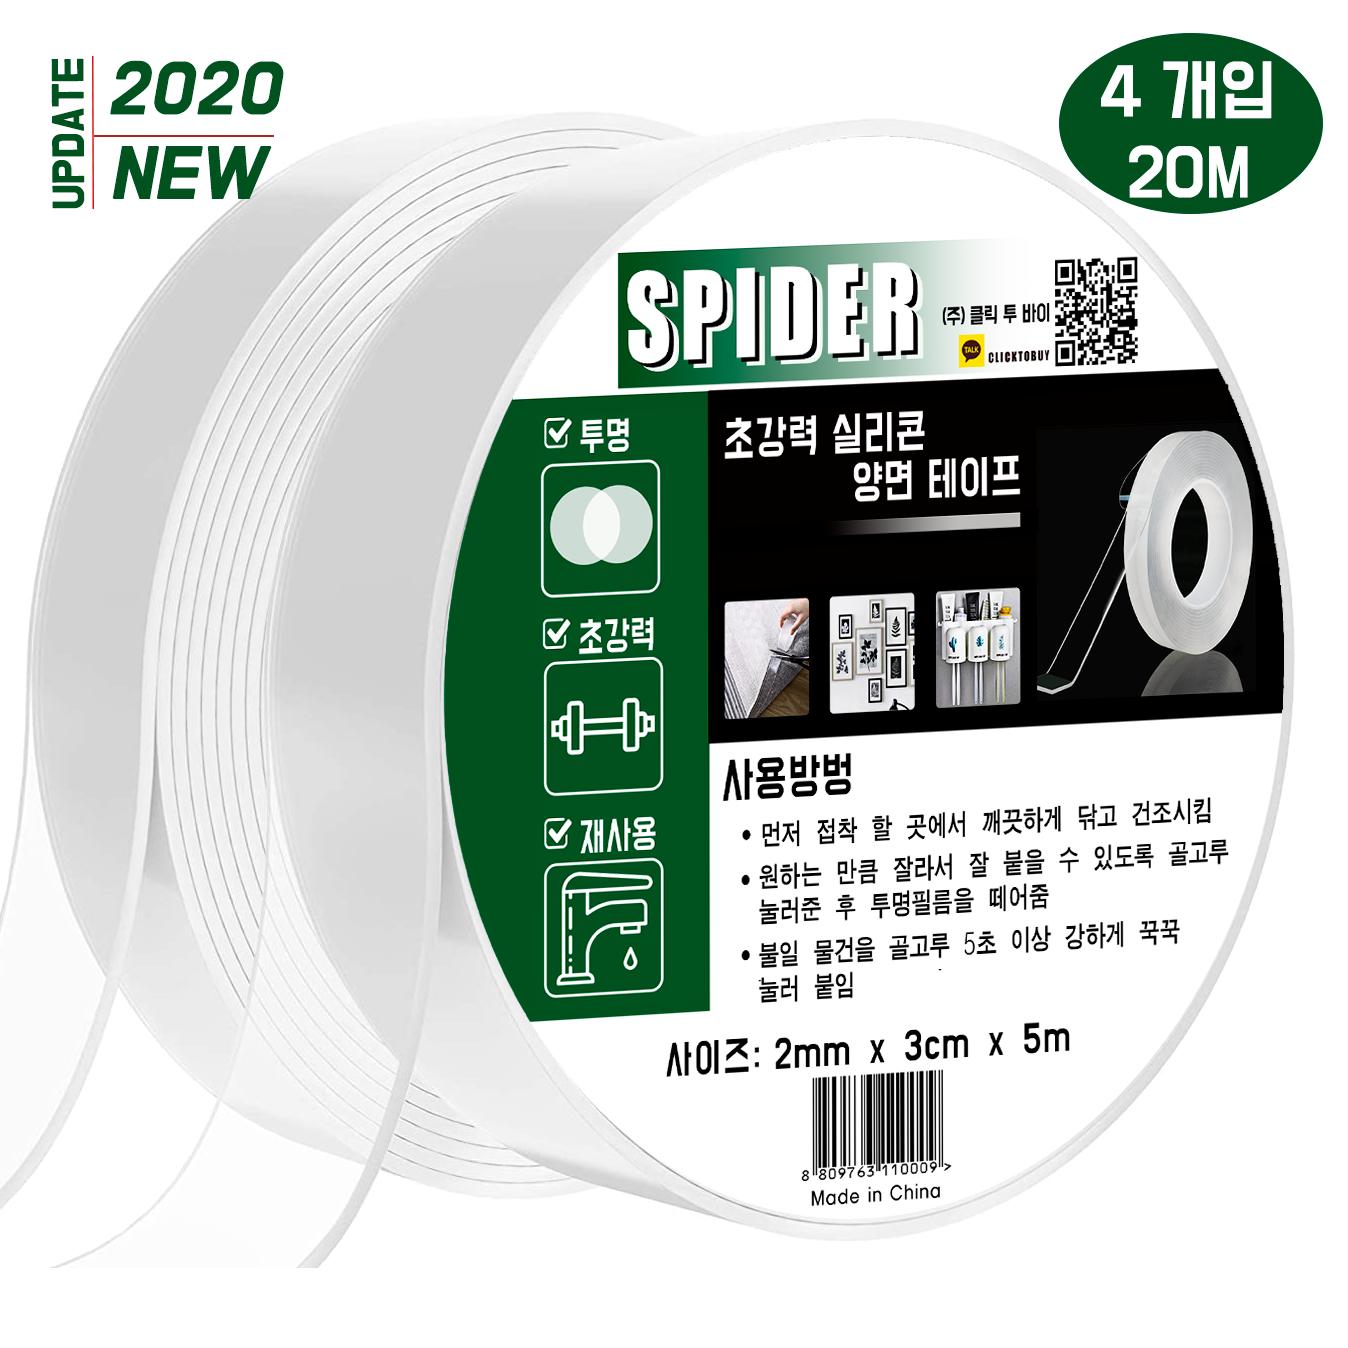 Spider Tape 자국없는 초강력 실리콘 양면 테이프 (2mm x 3cm 5M) 대량 할인, 4개입